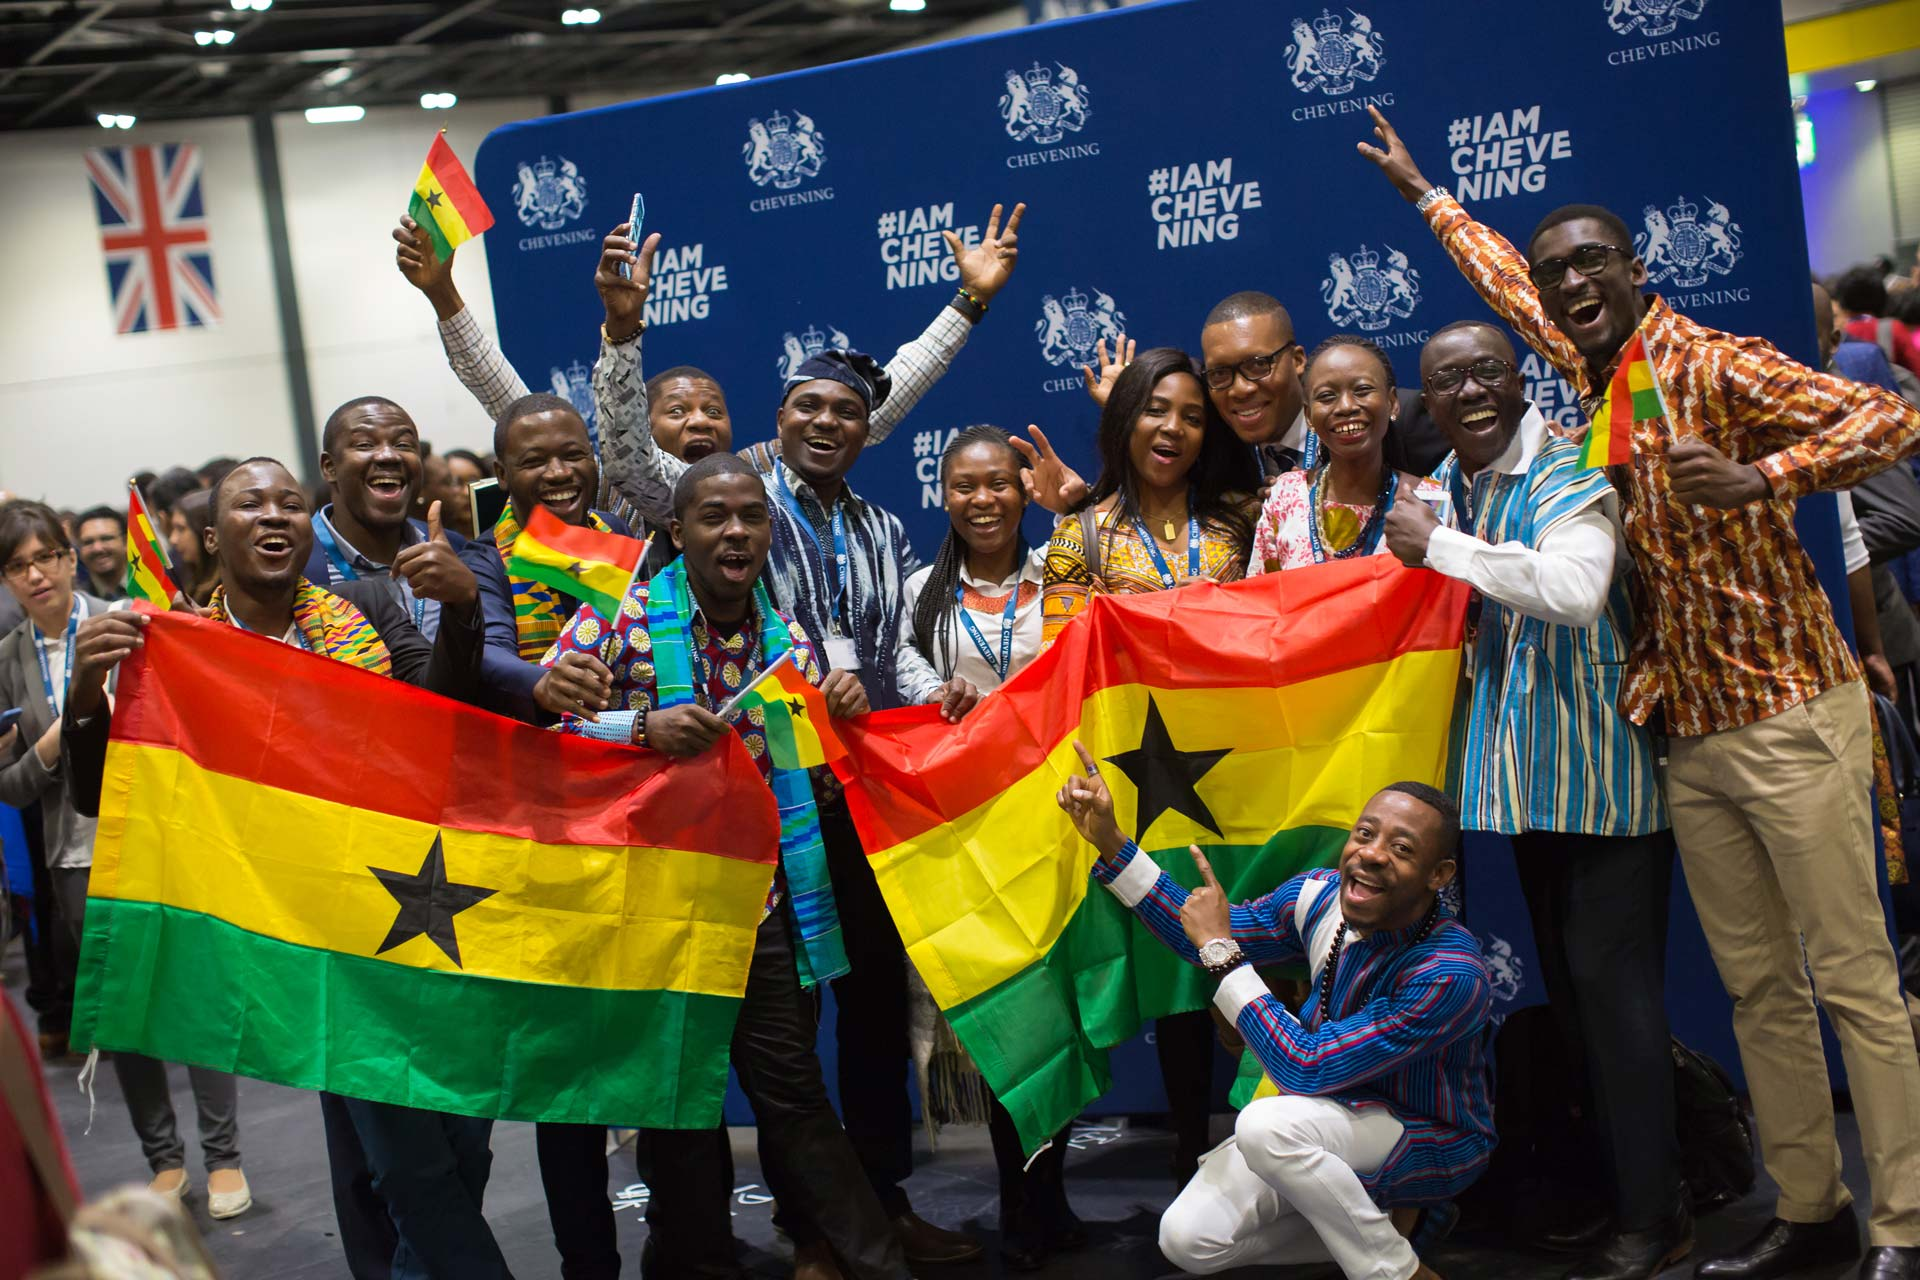 Chevening in Ghana